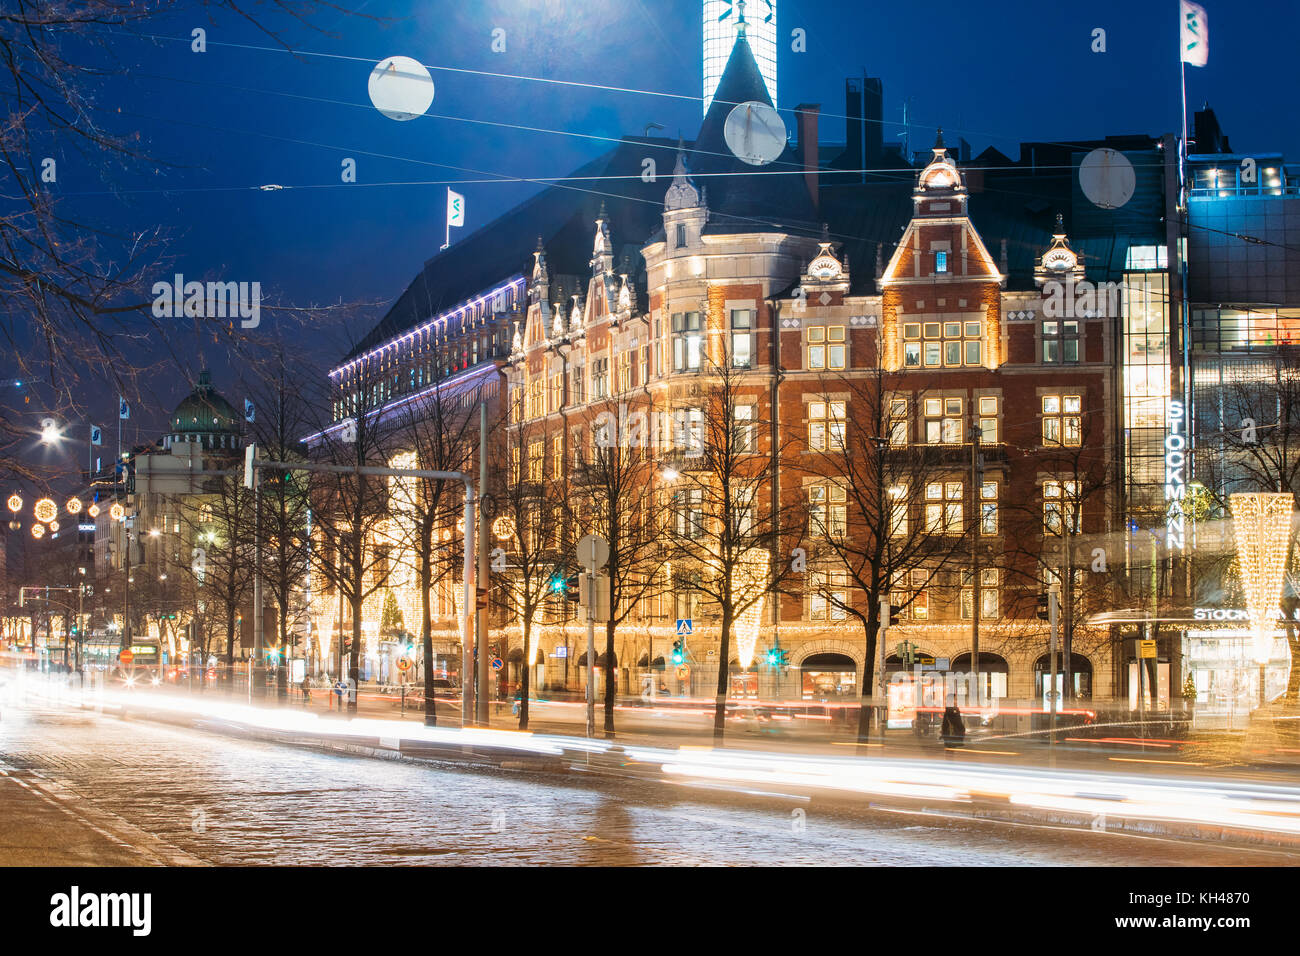 Helsinki, Finland - December 7, 2016: Night View Of Traffic Light Trails In Mannerheim Avenue Street In Evening - Stock Image